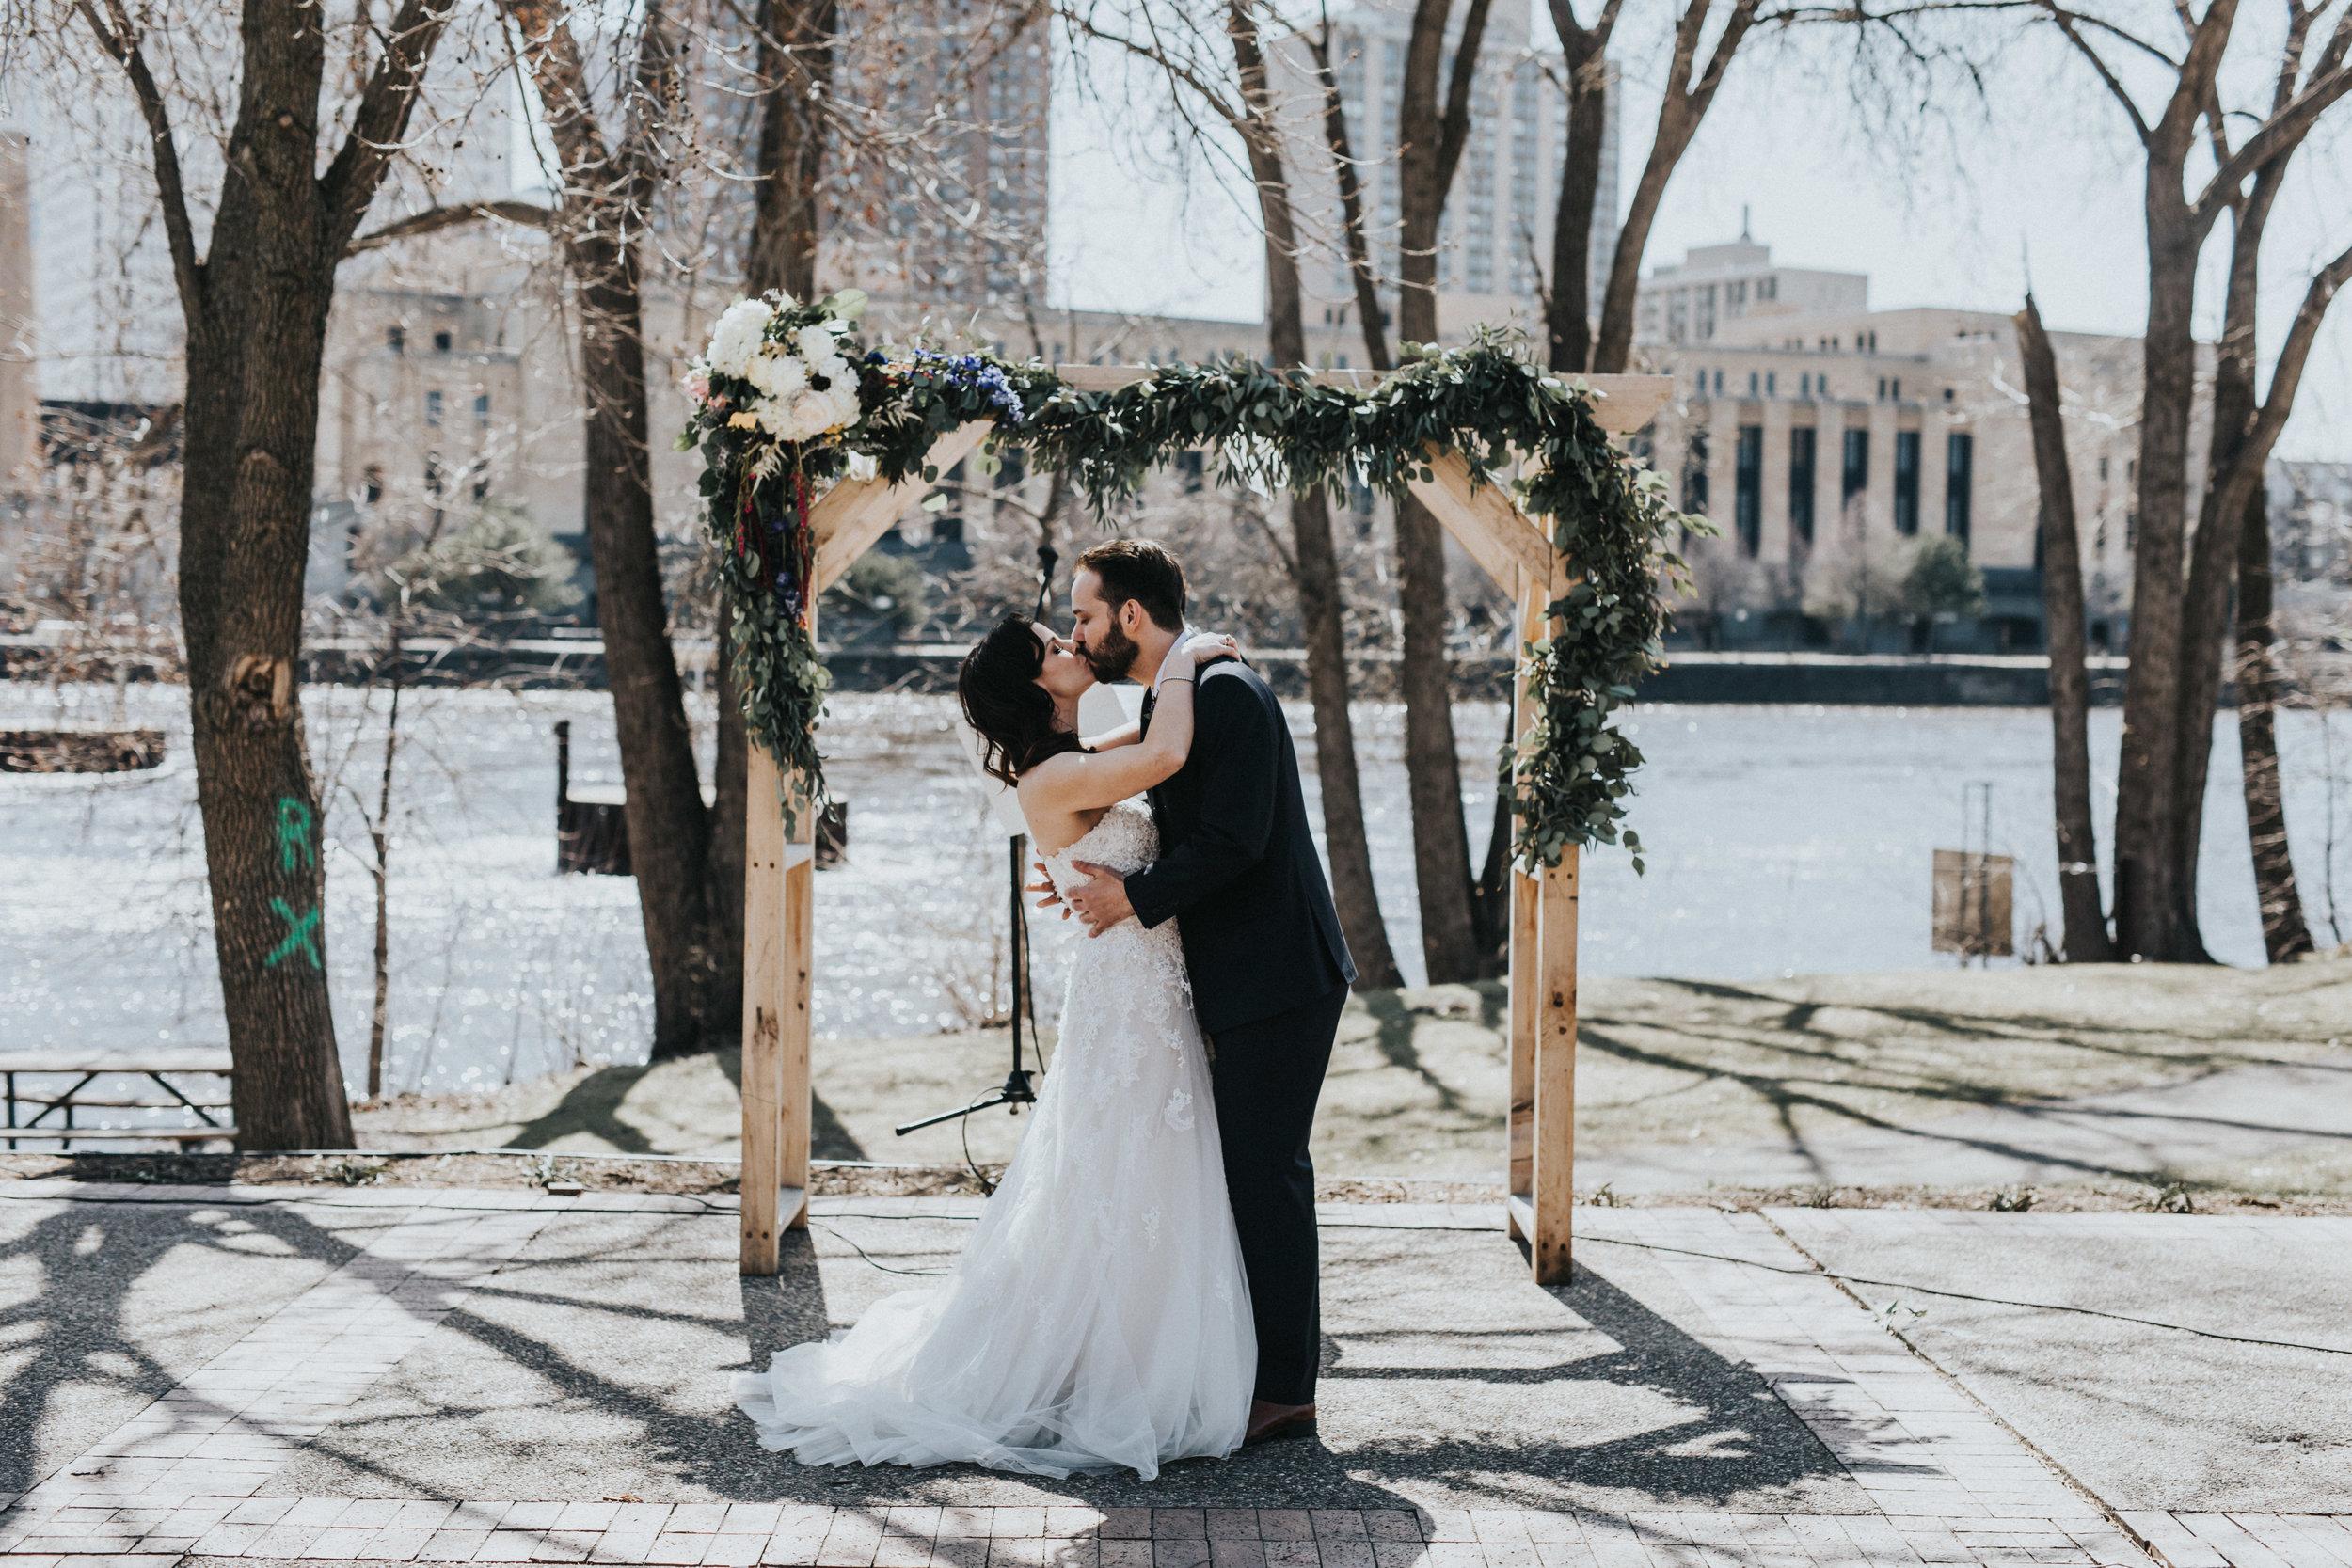 Non Religious Wedding.How To Have A Non Religious Wedding Sixpence Events